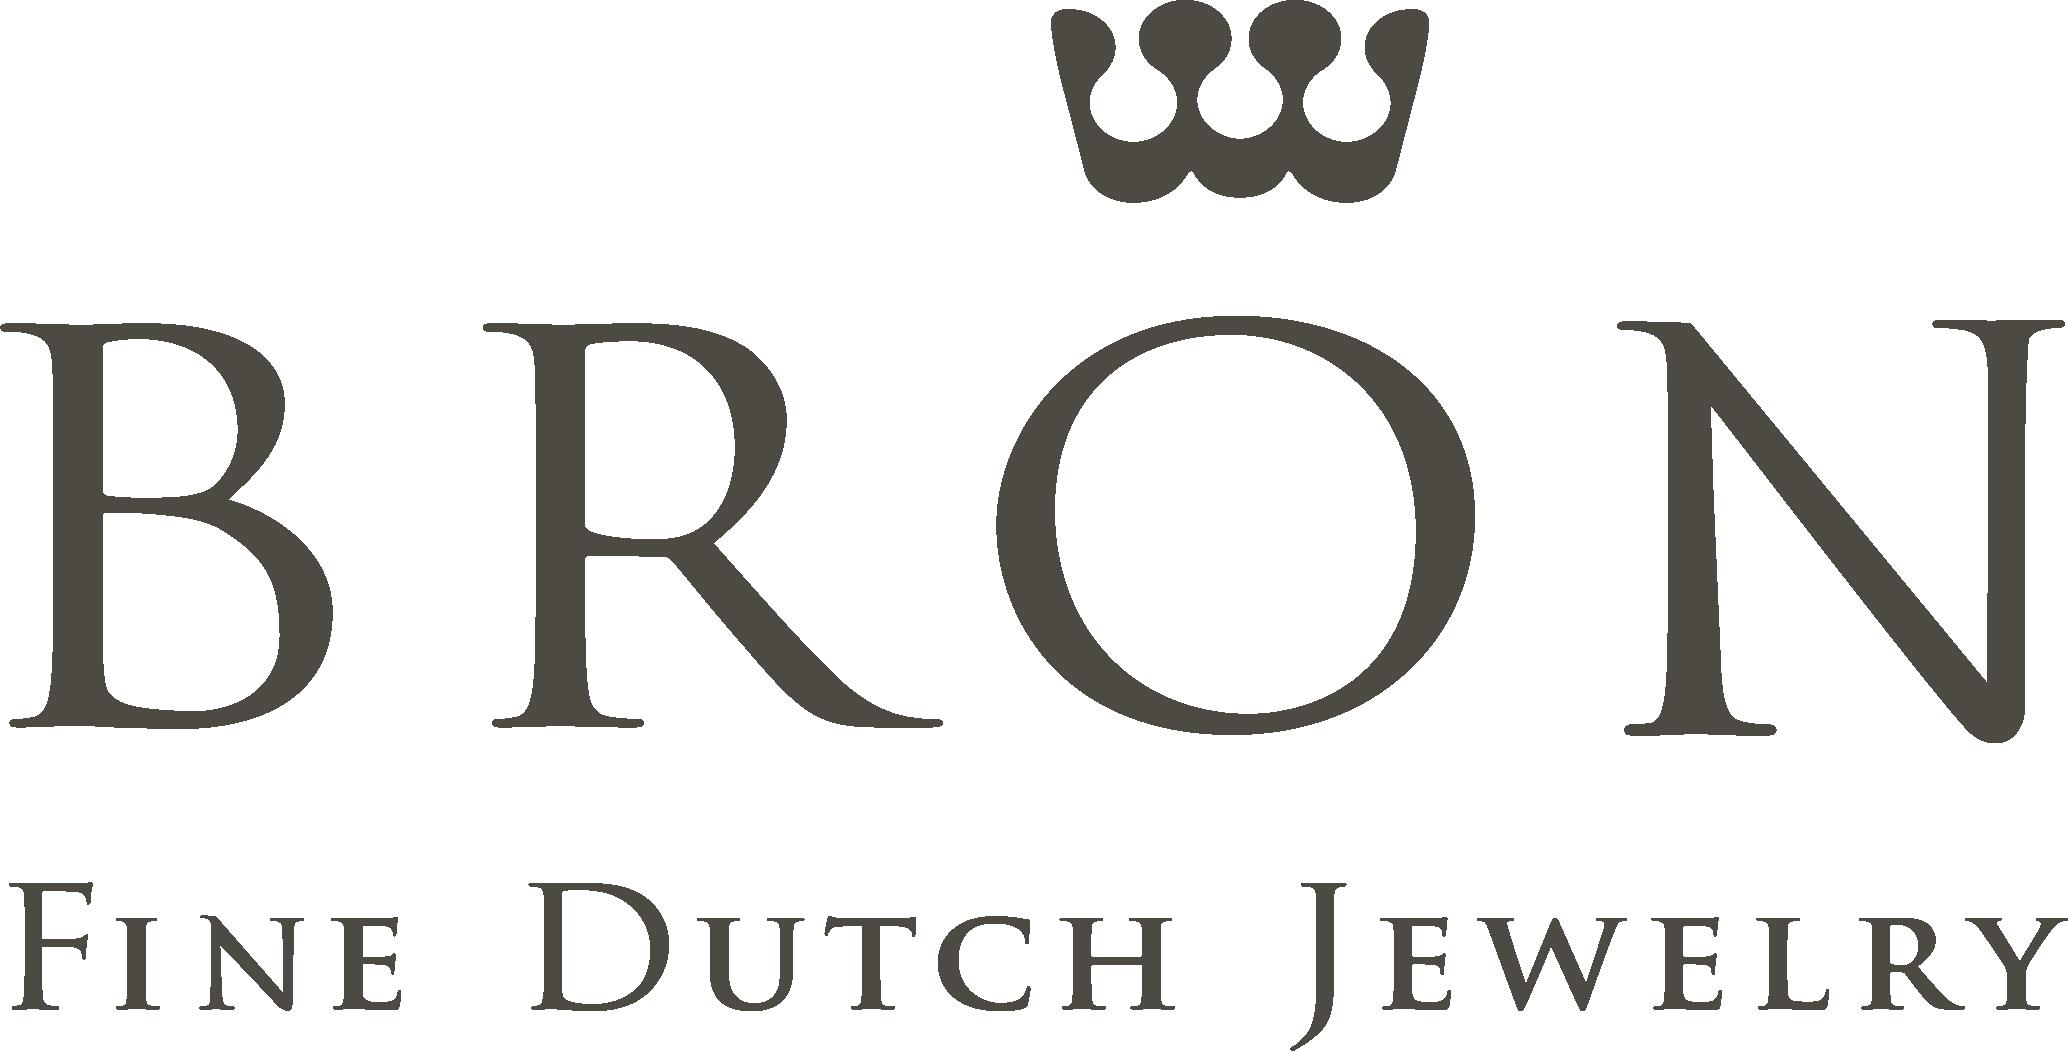 Bron, logo, jewelry, juwelen, franssen